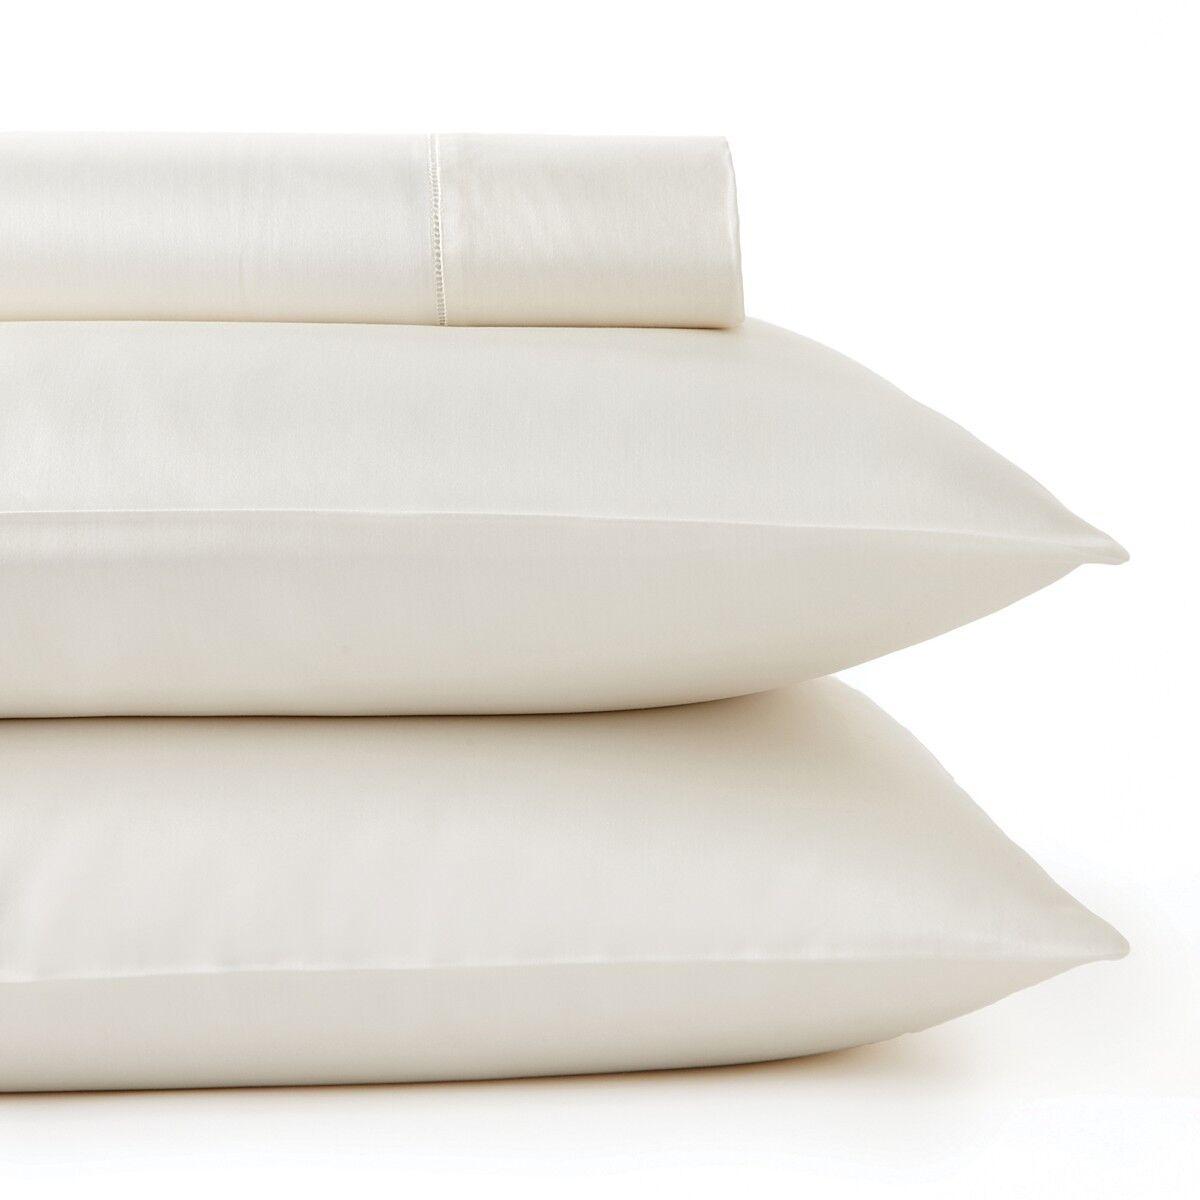 Sferra Giotto 734 Bedding 100% Egyptian Cotton QUEEN Flat Sheet IVORY  350 C616